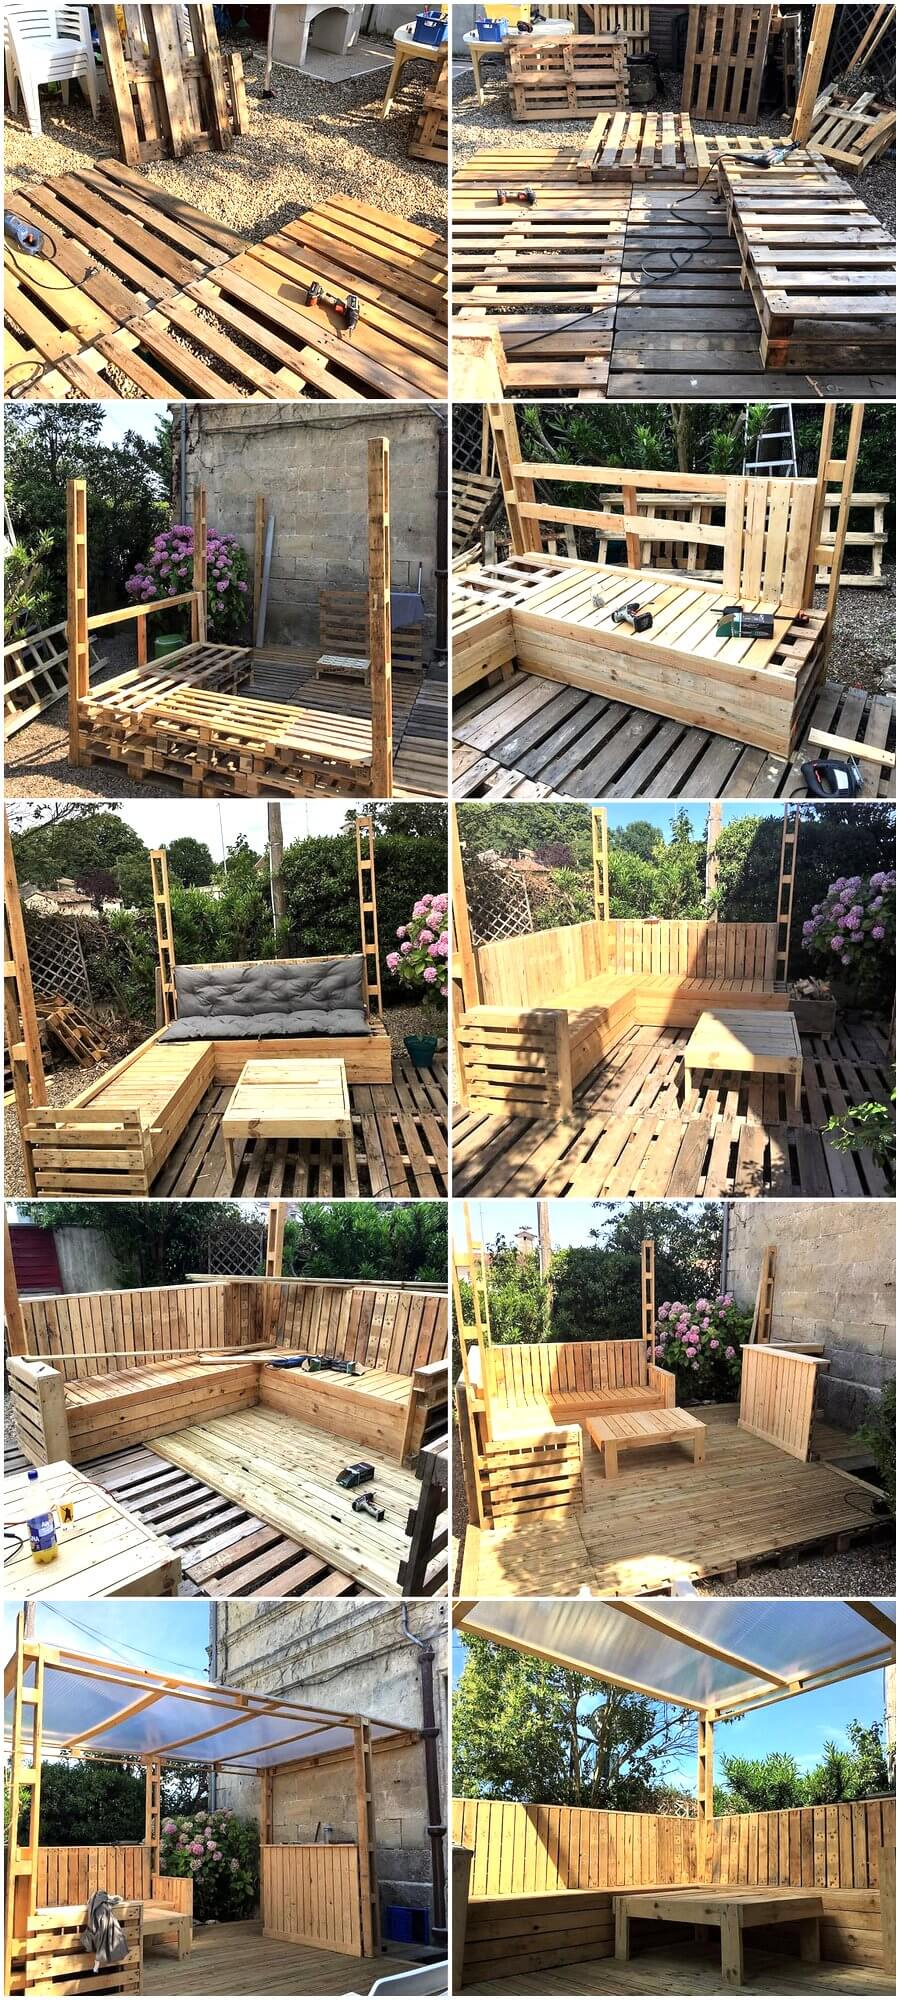 Diy Wood Pallets Patio Gazebo Deck With